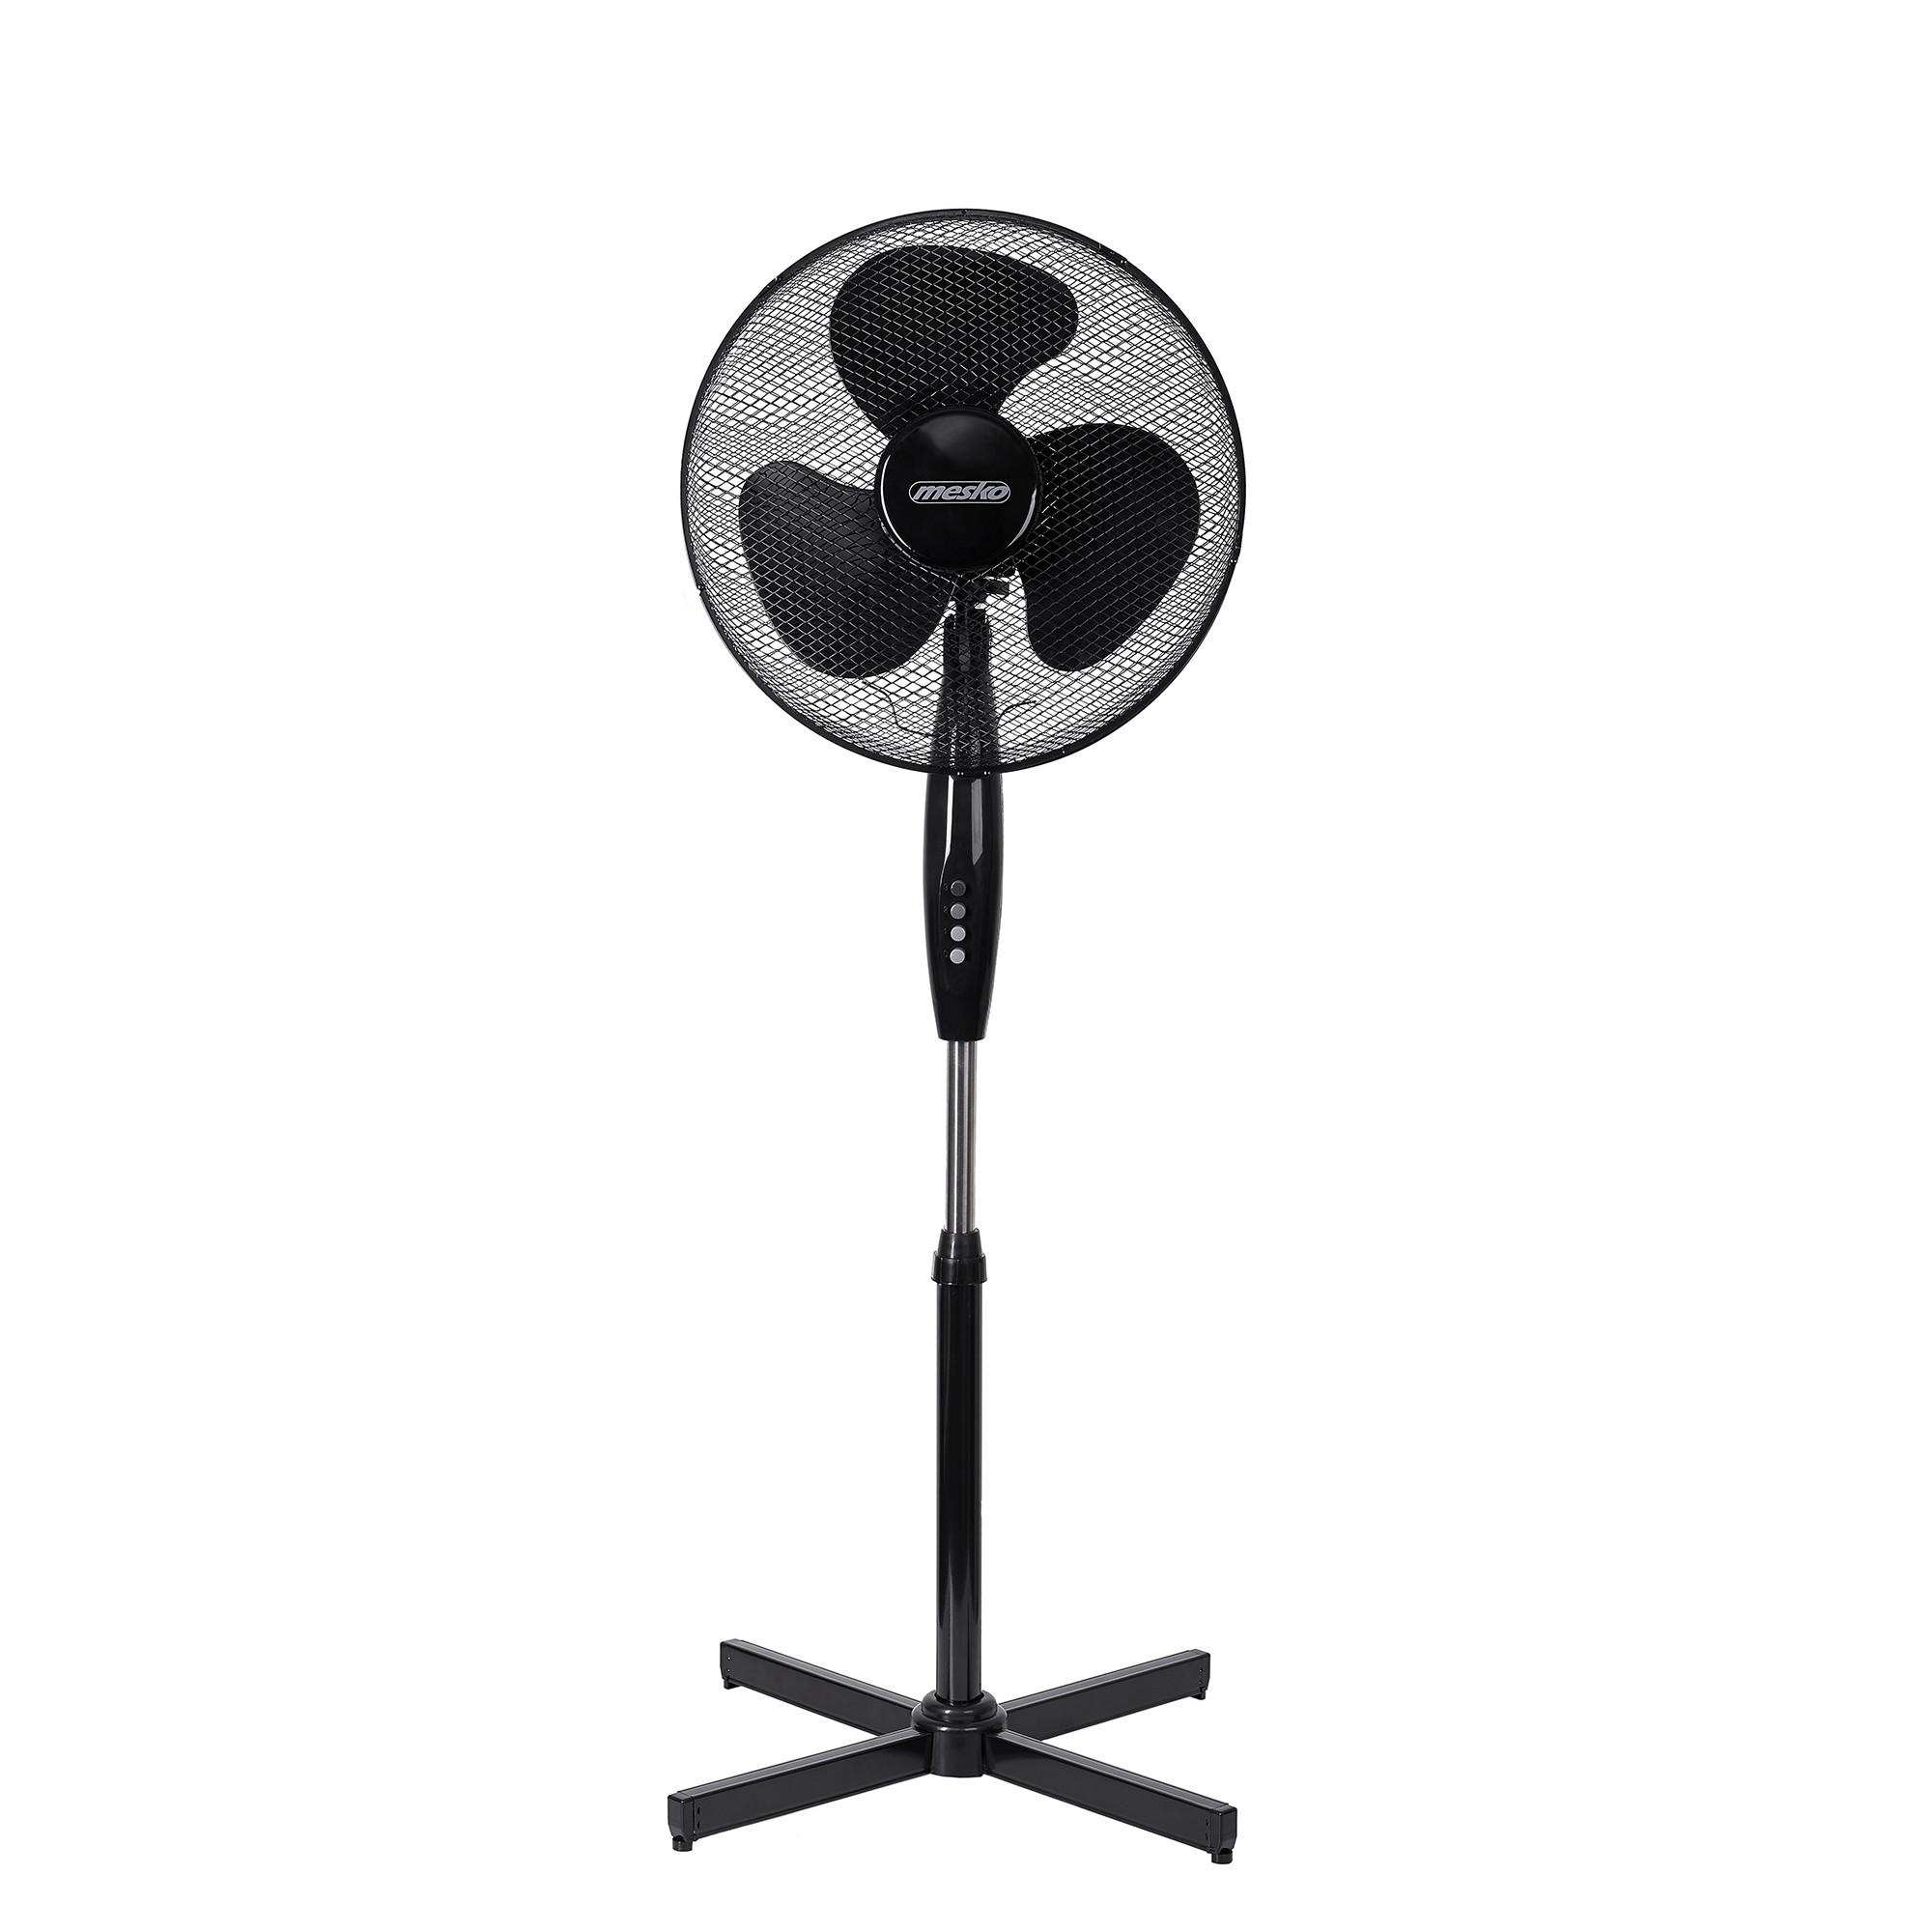 Mesko MS7311 Ventilador de pie oscilante, Reclinable 40 cm, Altura Ajustable, 3 velocidades, Negro, 90W